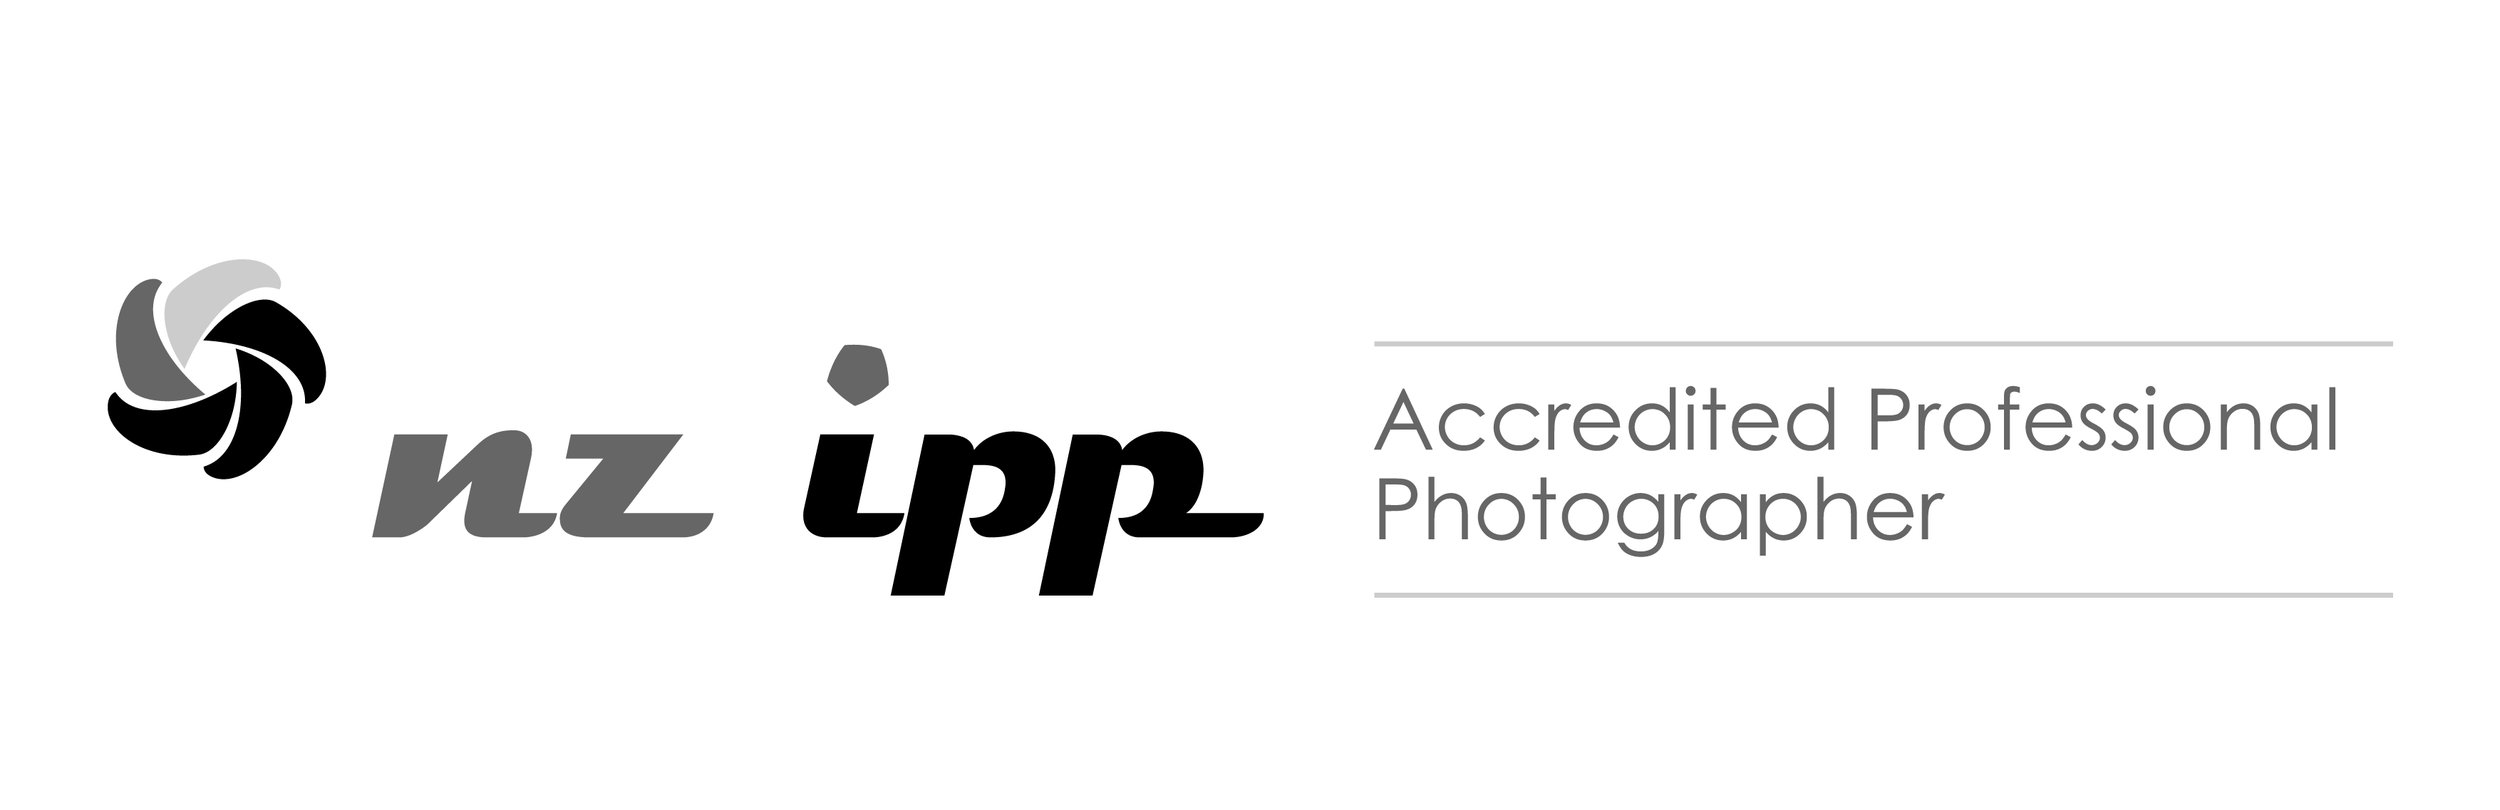 NZIPP Logo